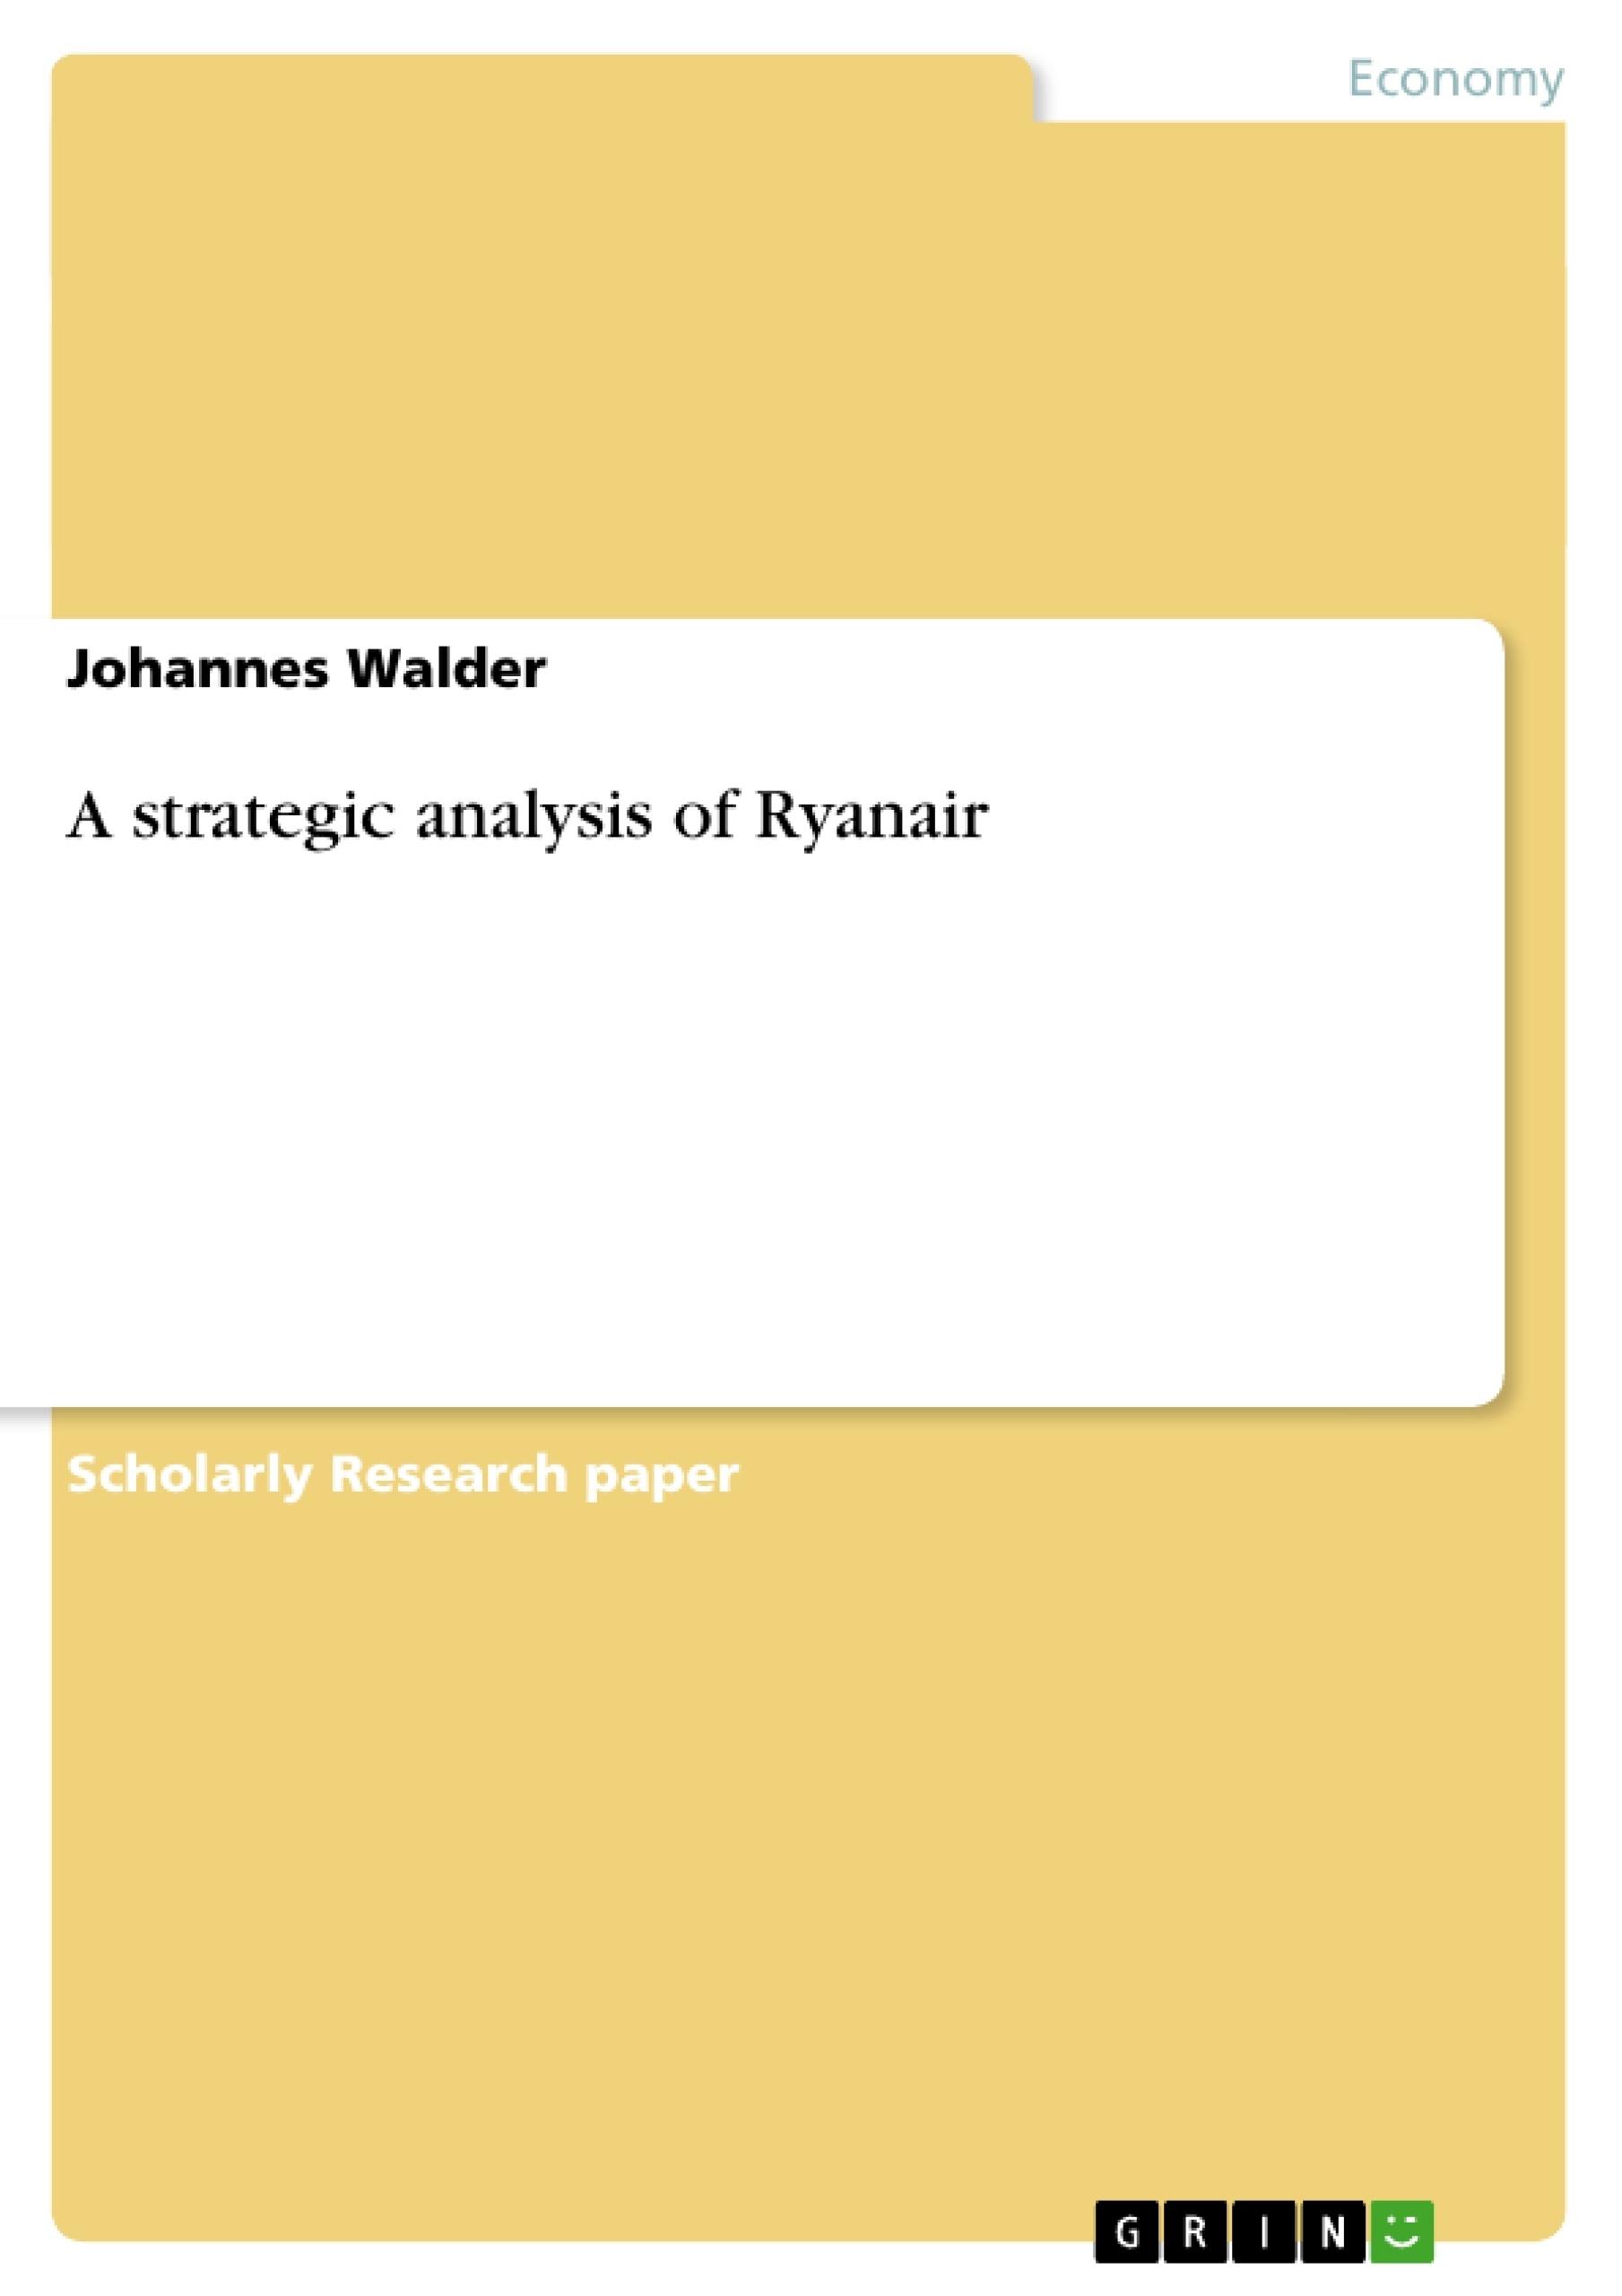 Title: A strategic analysis of Ryanair